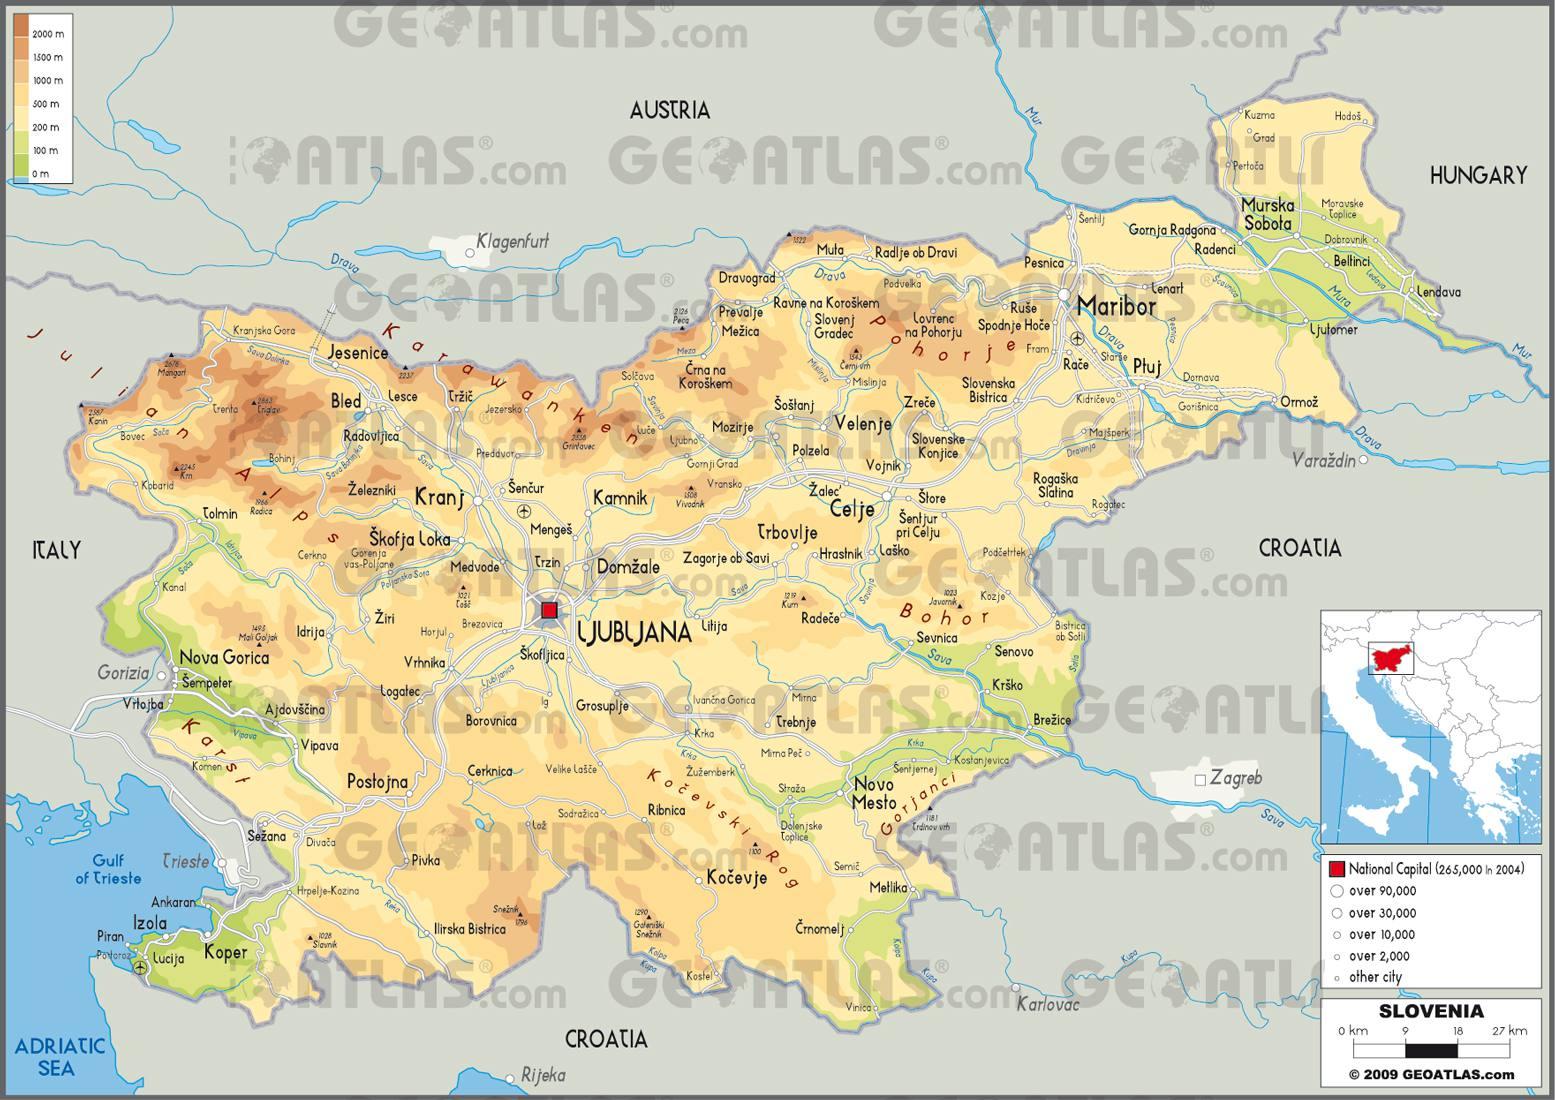 Carte de la Slovénie